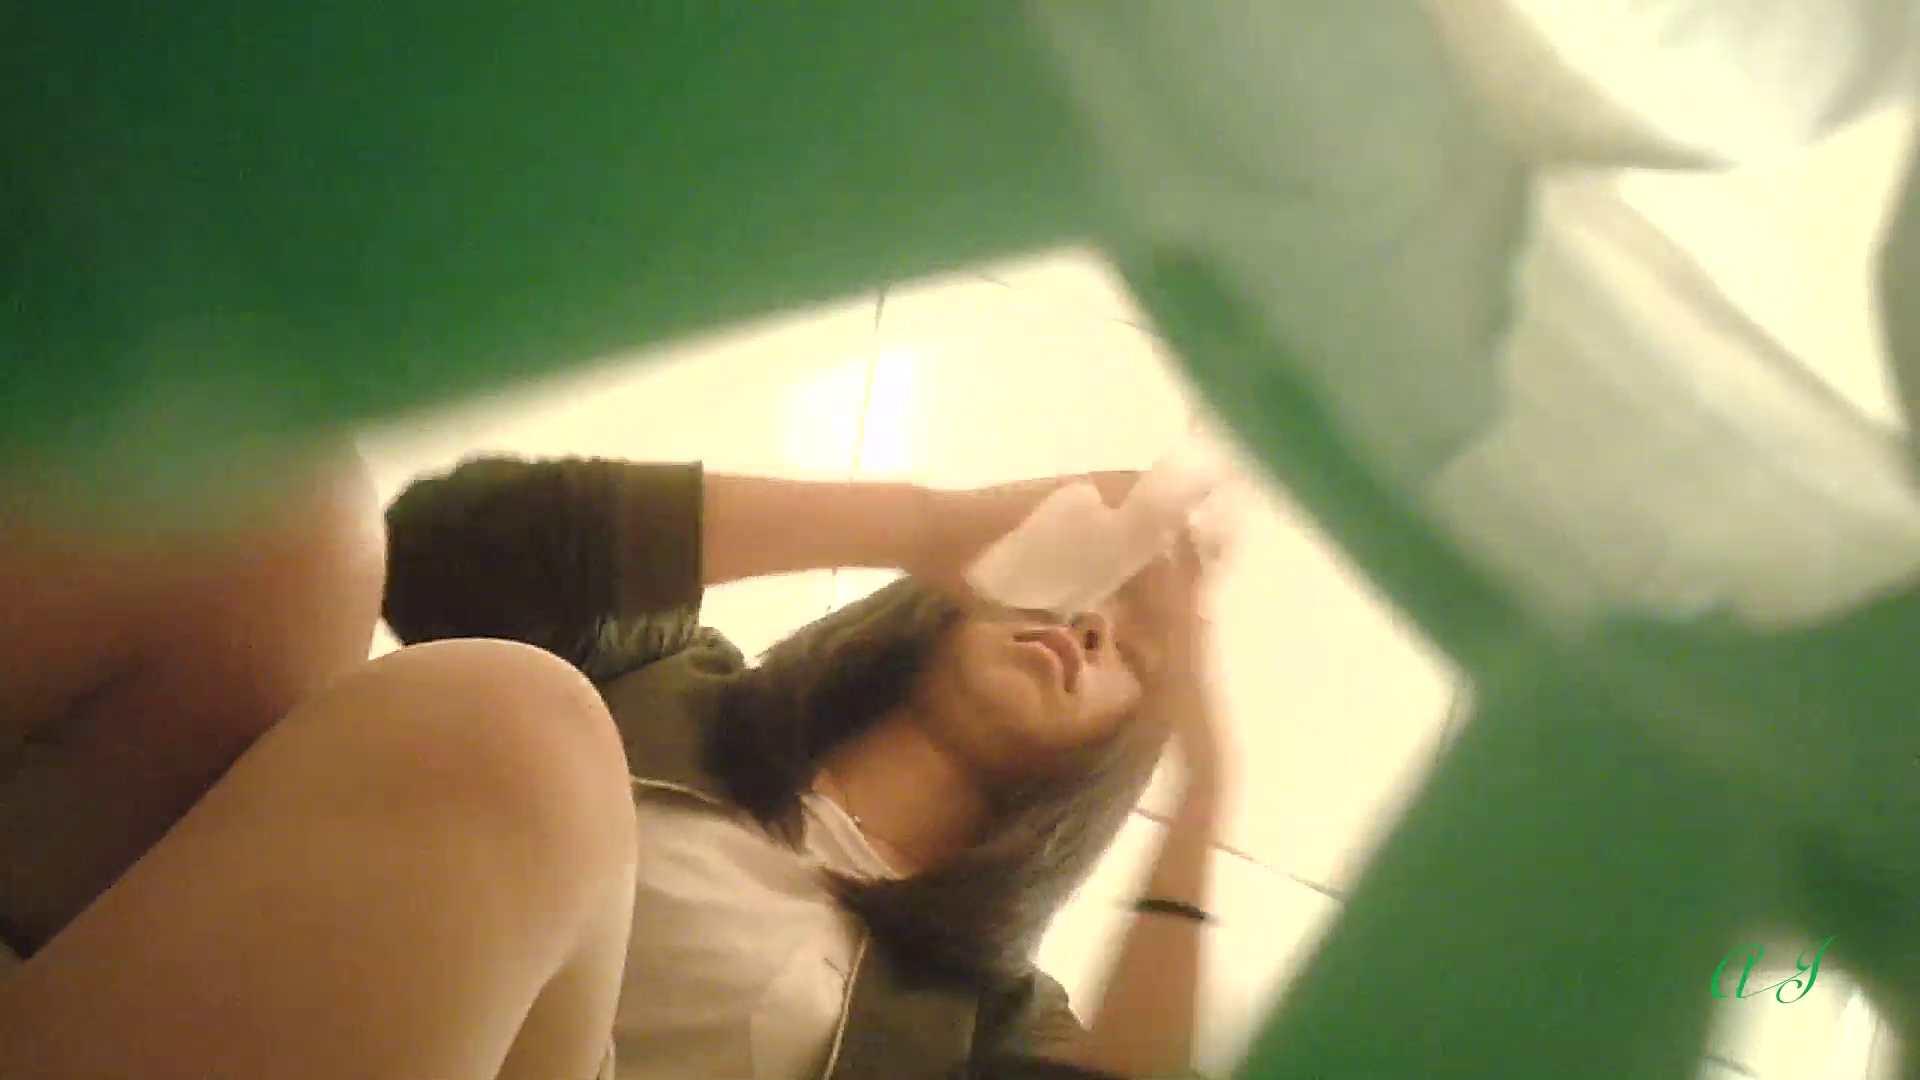 有名大学女性洗面所 vol.64 圧巻!総勢8名全員美女ばかり!! 潜入シリーズ  69Pix 19